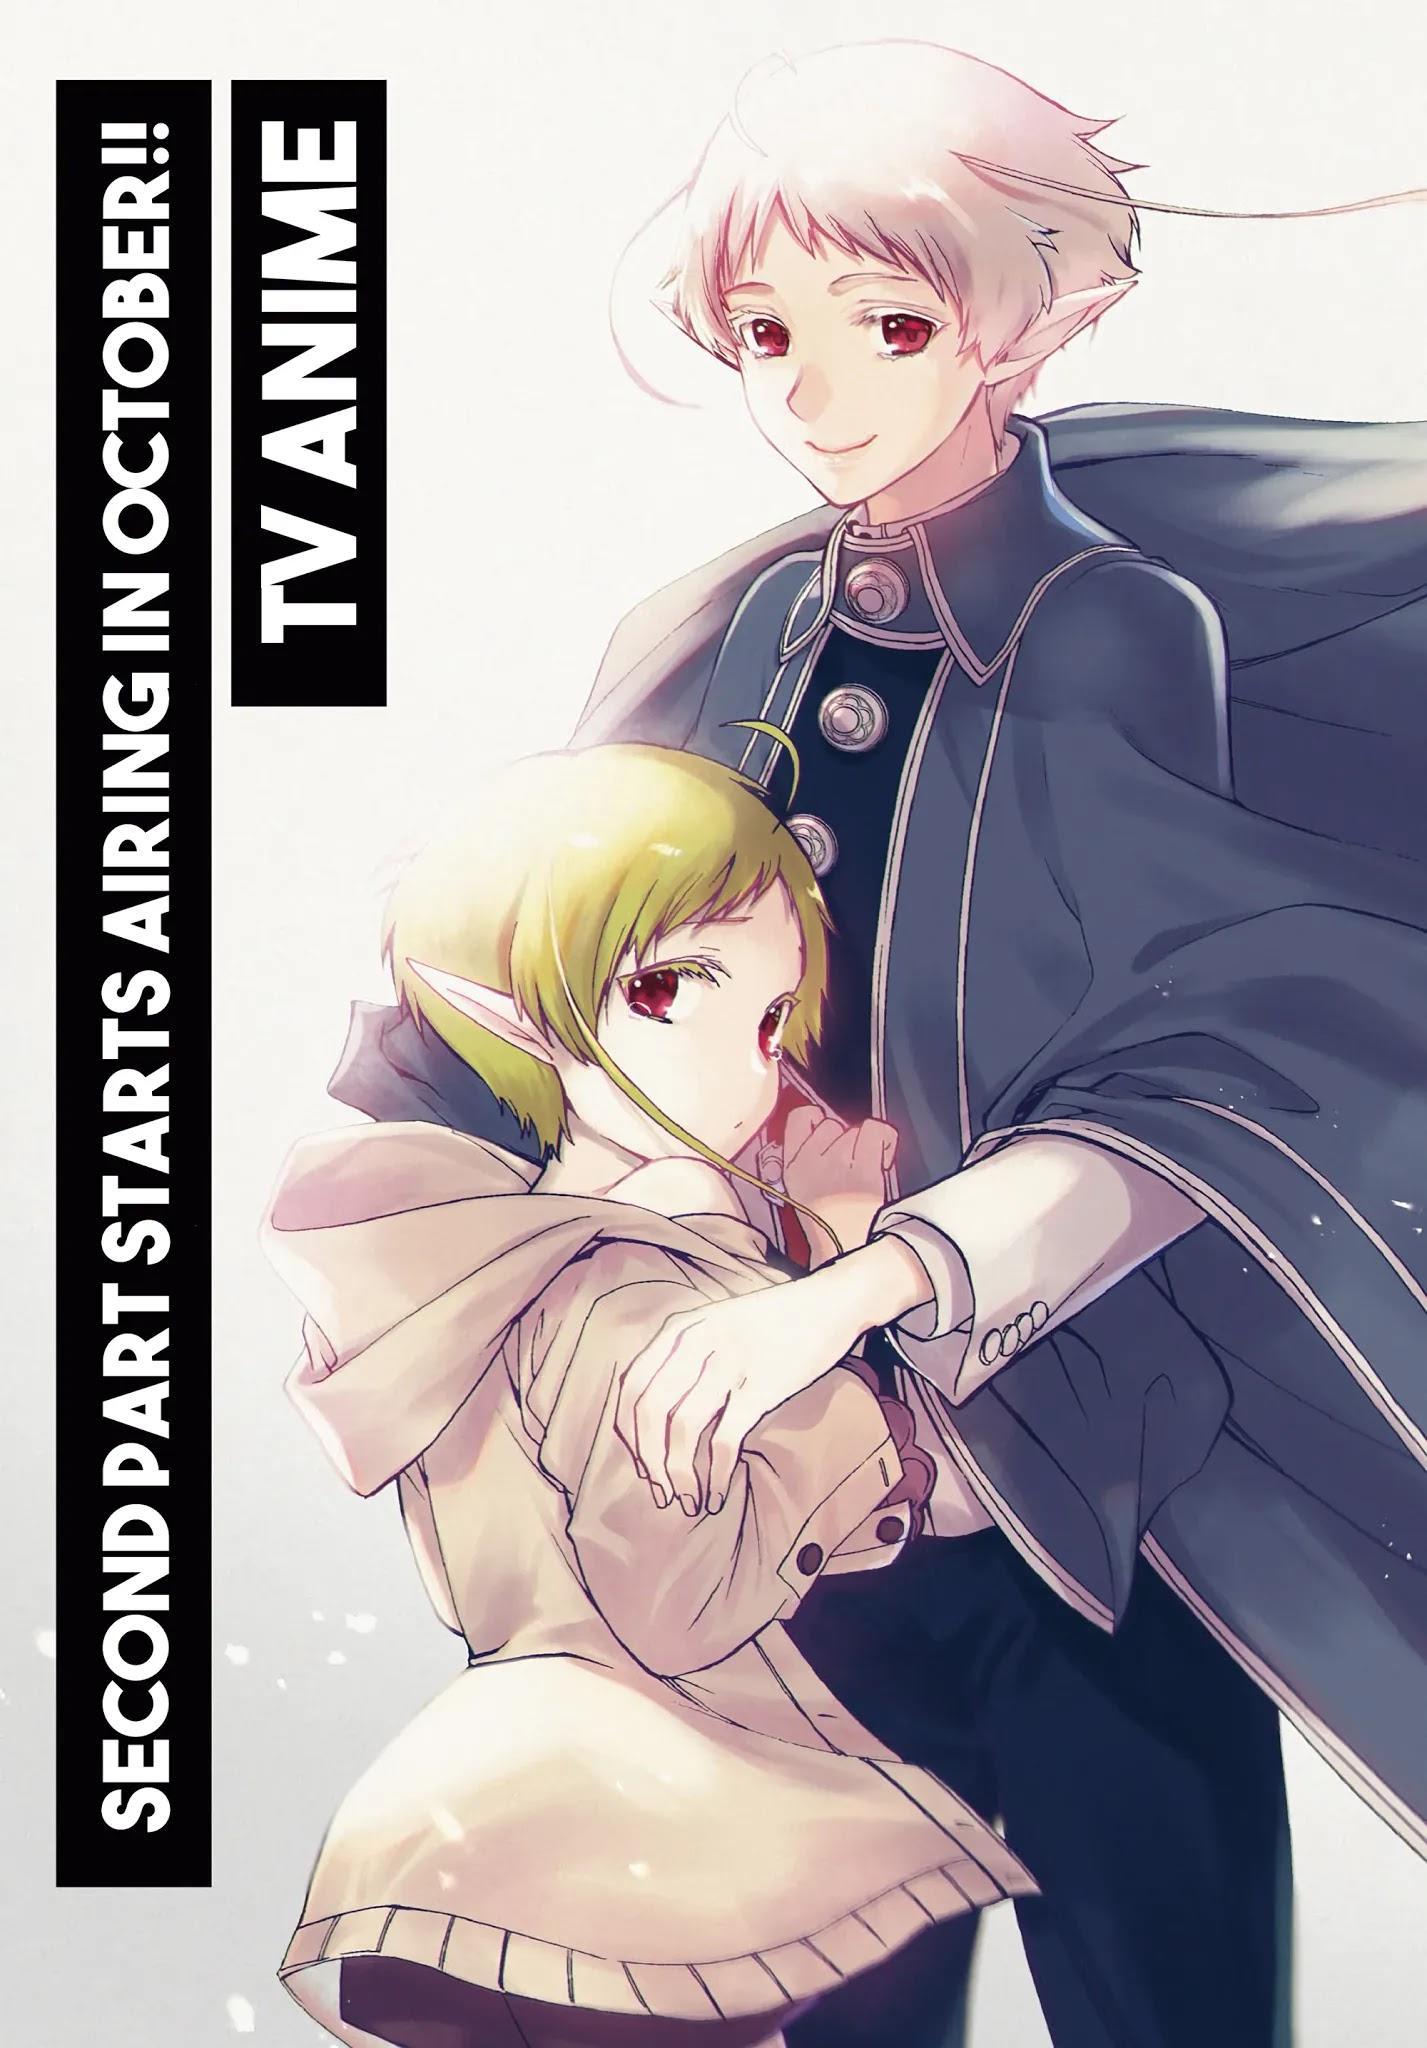 Mushoku Tensei - Isekai Ittara Honki Dasu Chapter 73: Forest Rain (Part 1) page 3 - Mangakakalots.com